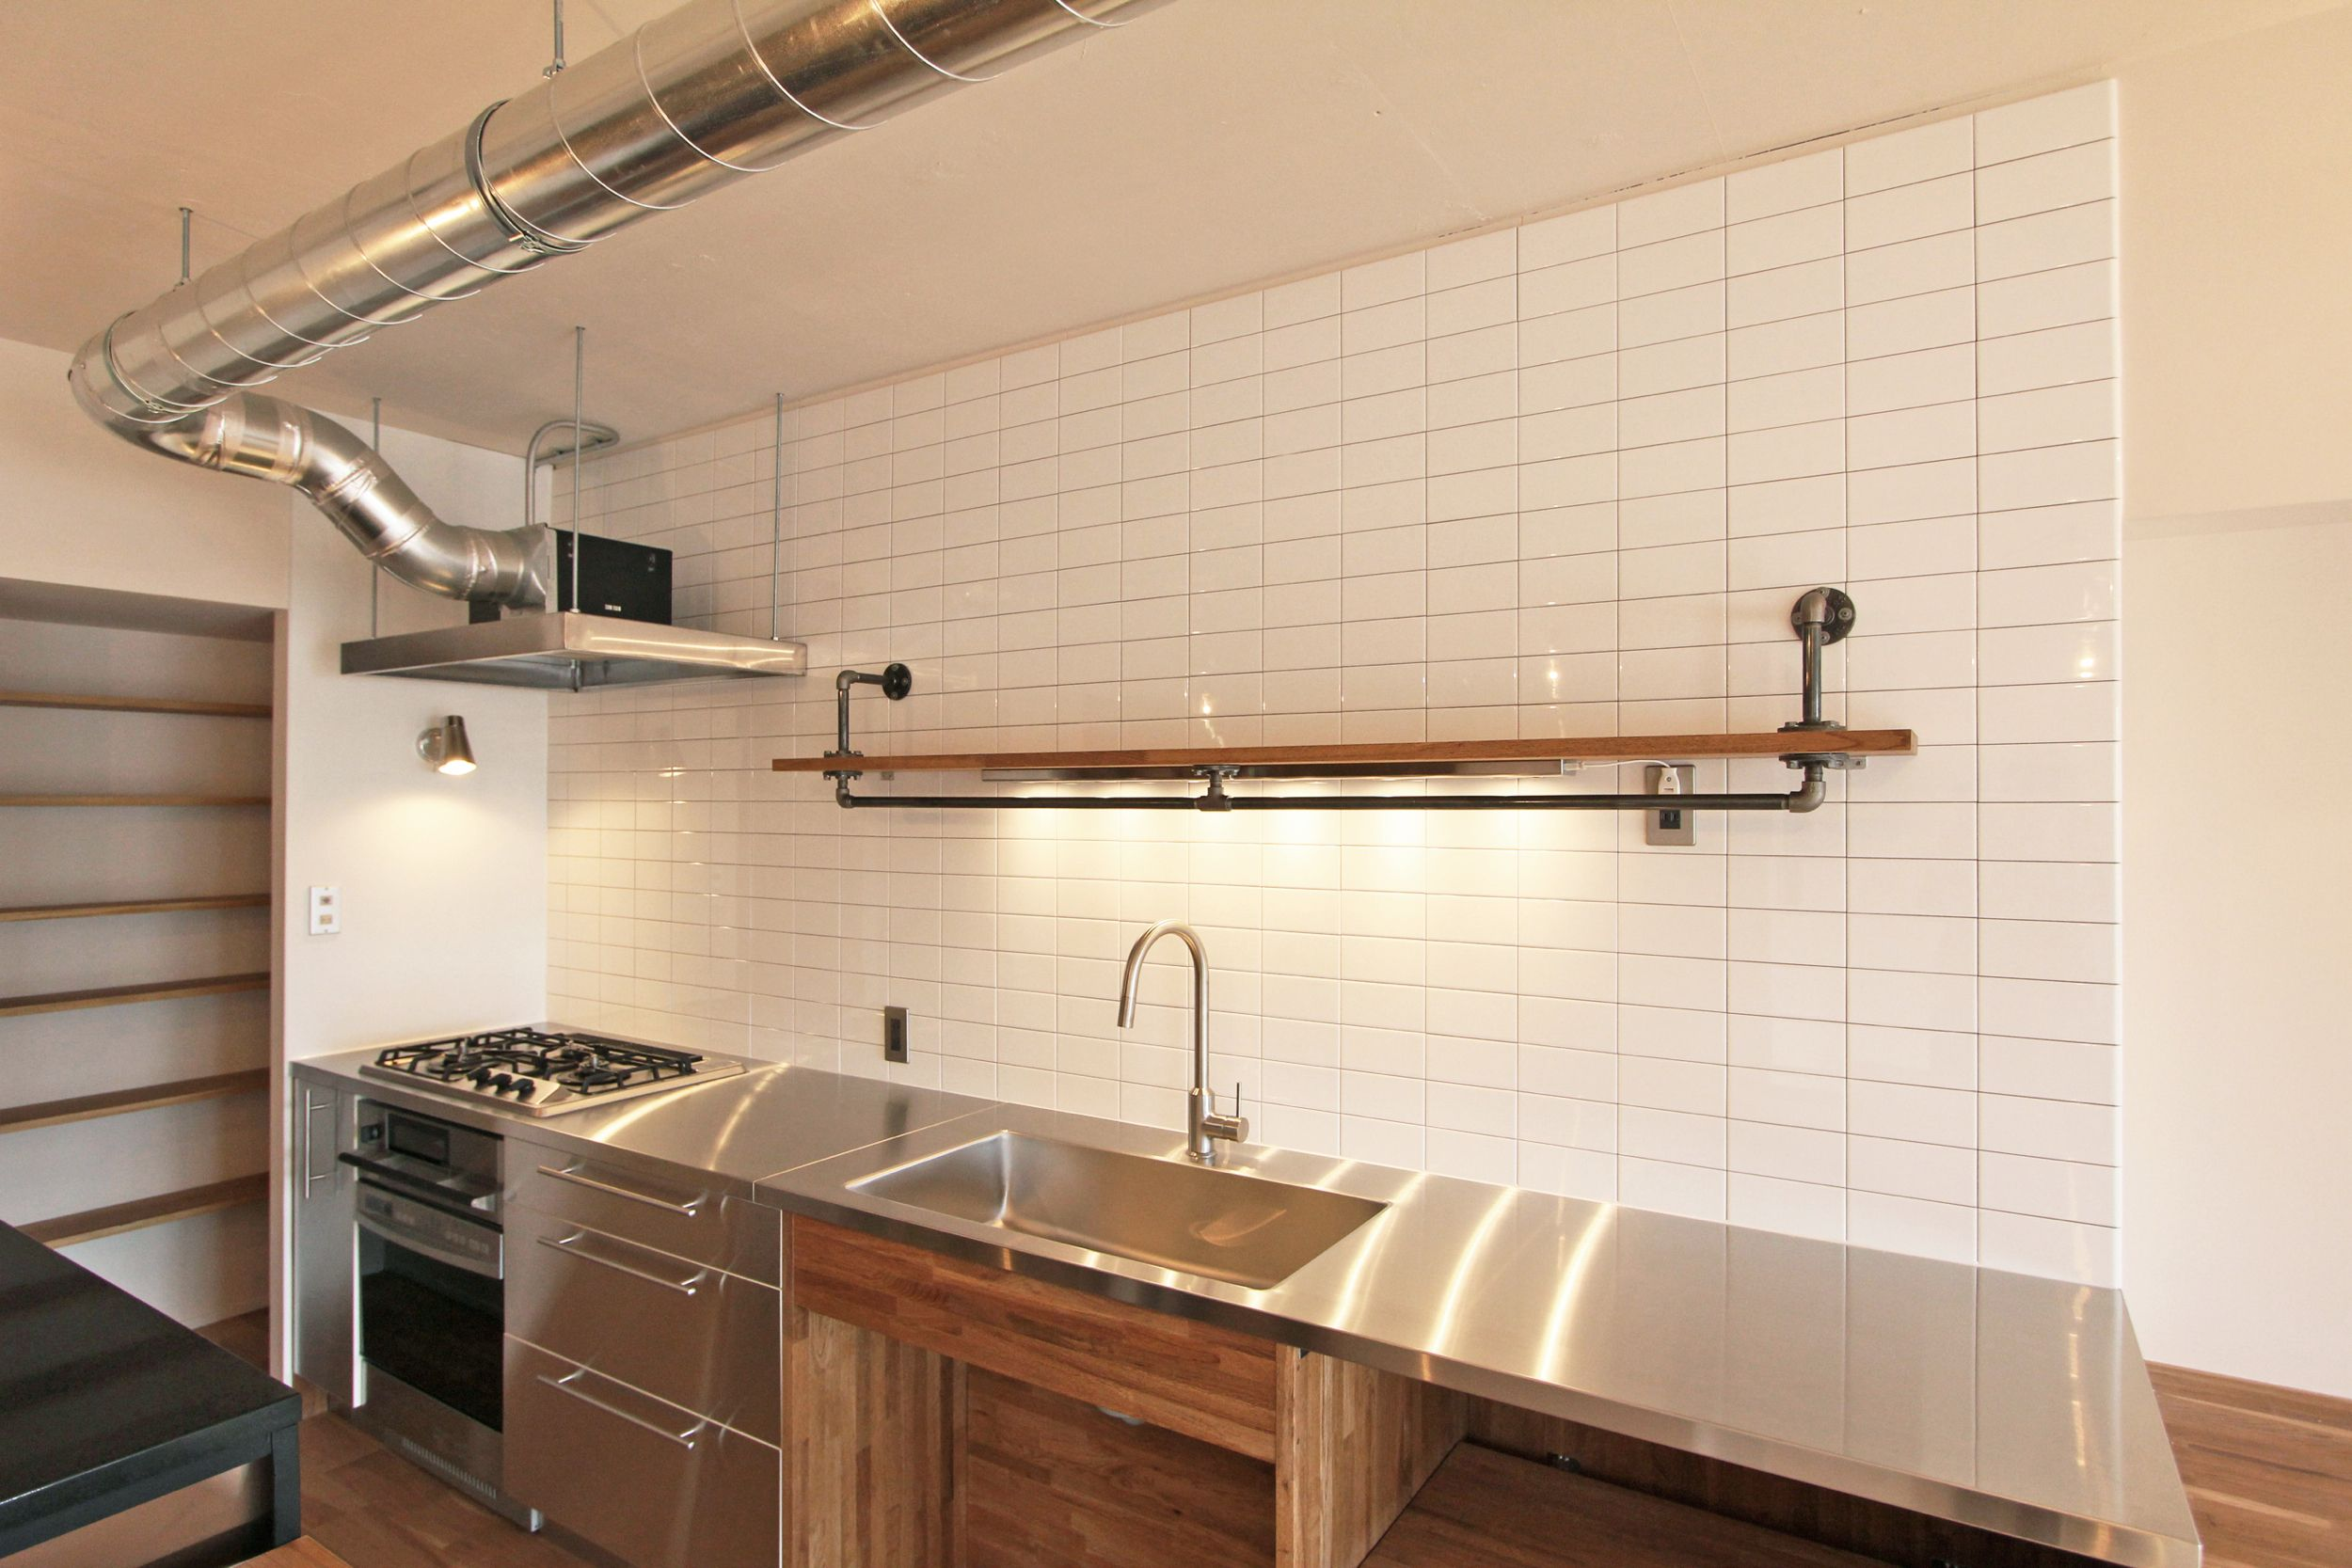 KITCHEN/counter/tile/pantry/tile/キッチン/タイル/パントリー ...